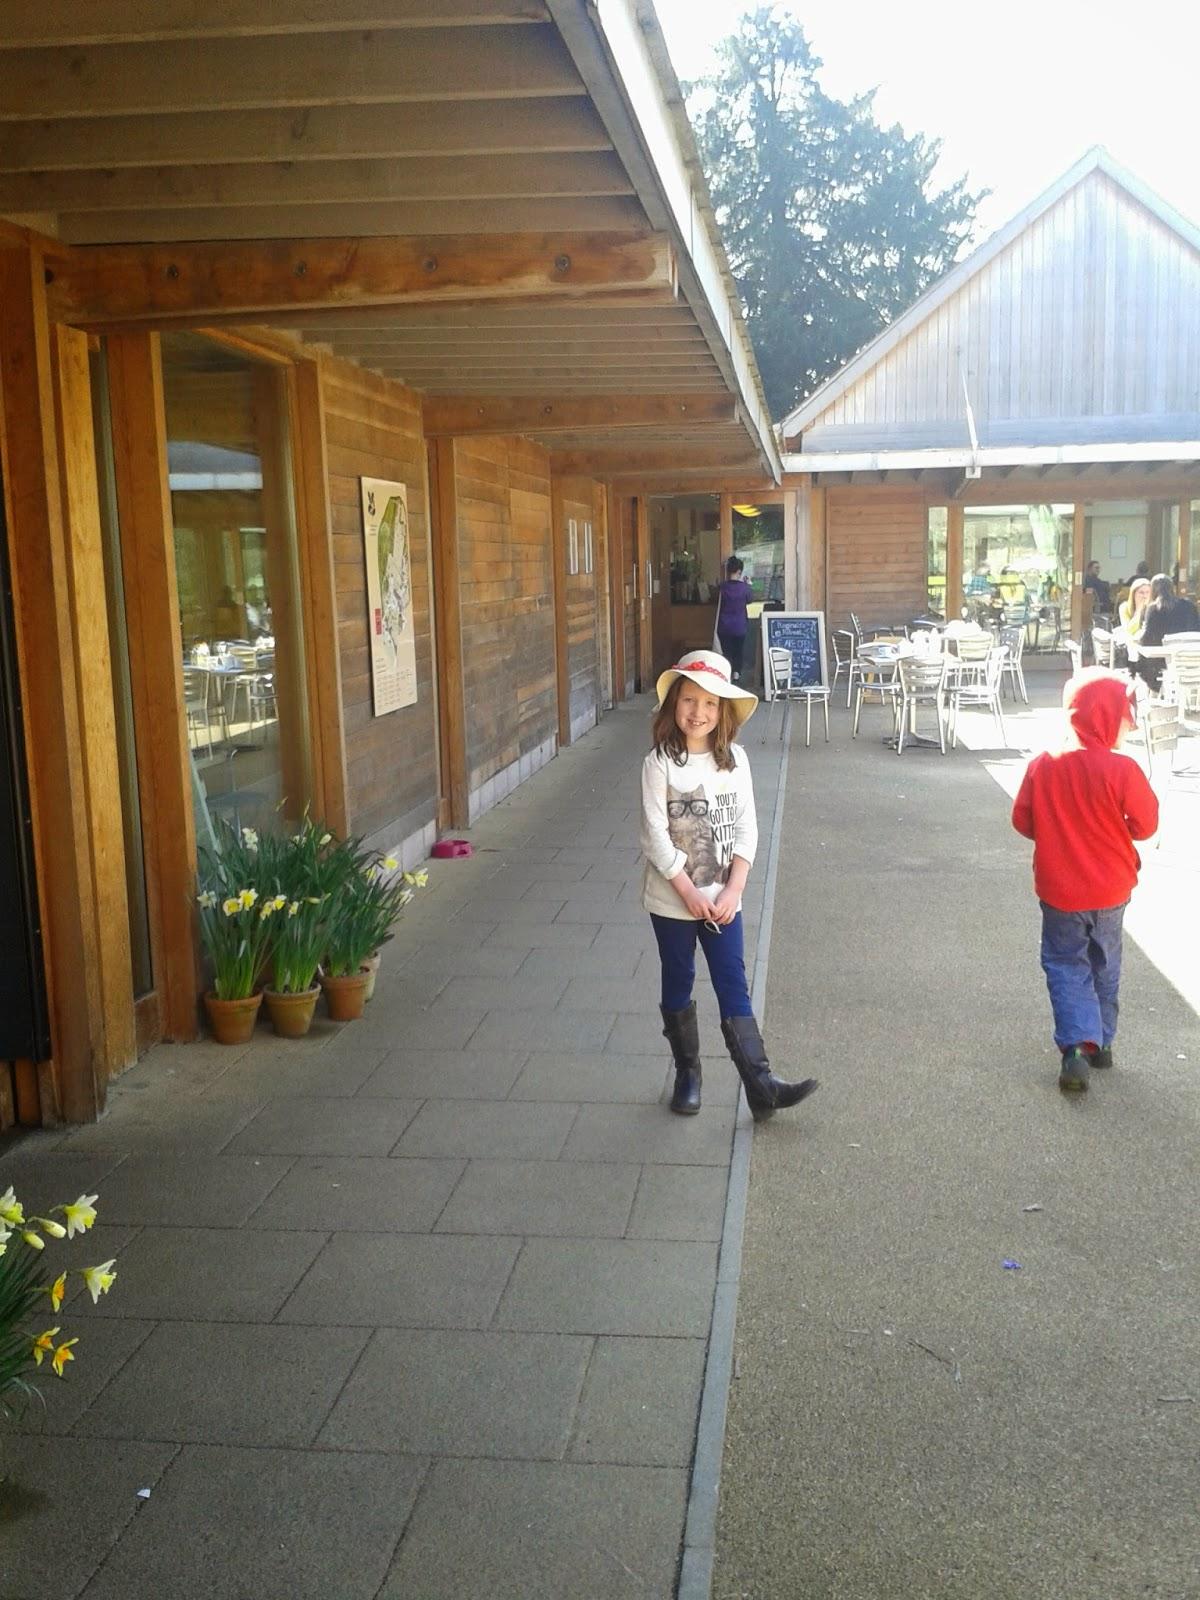 Visitors' Centre & Coffee Shop, Dyffryn Gardens